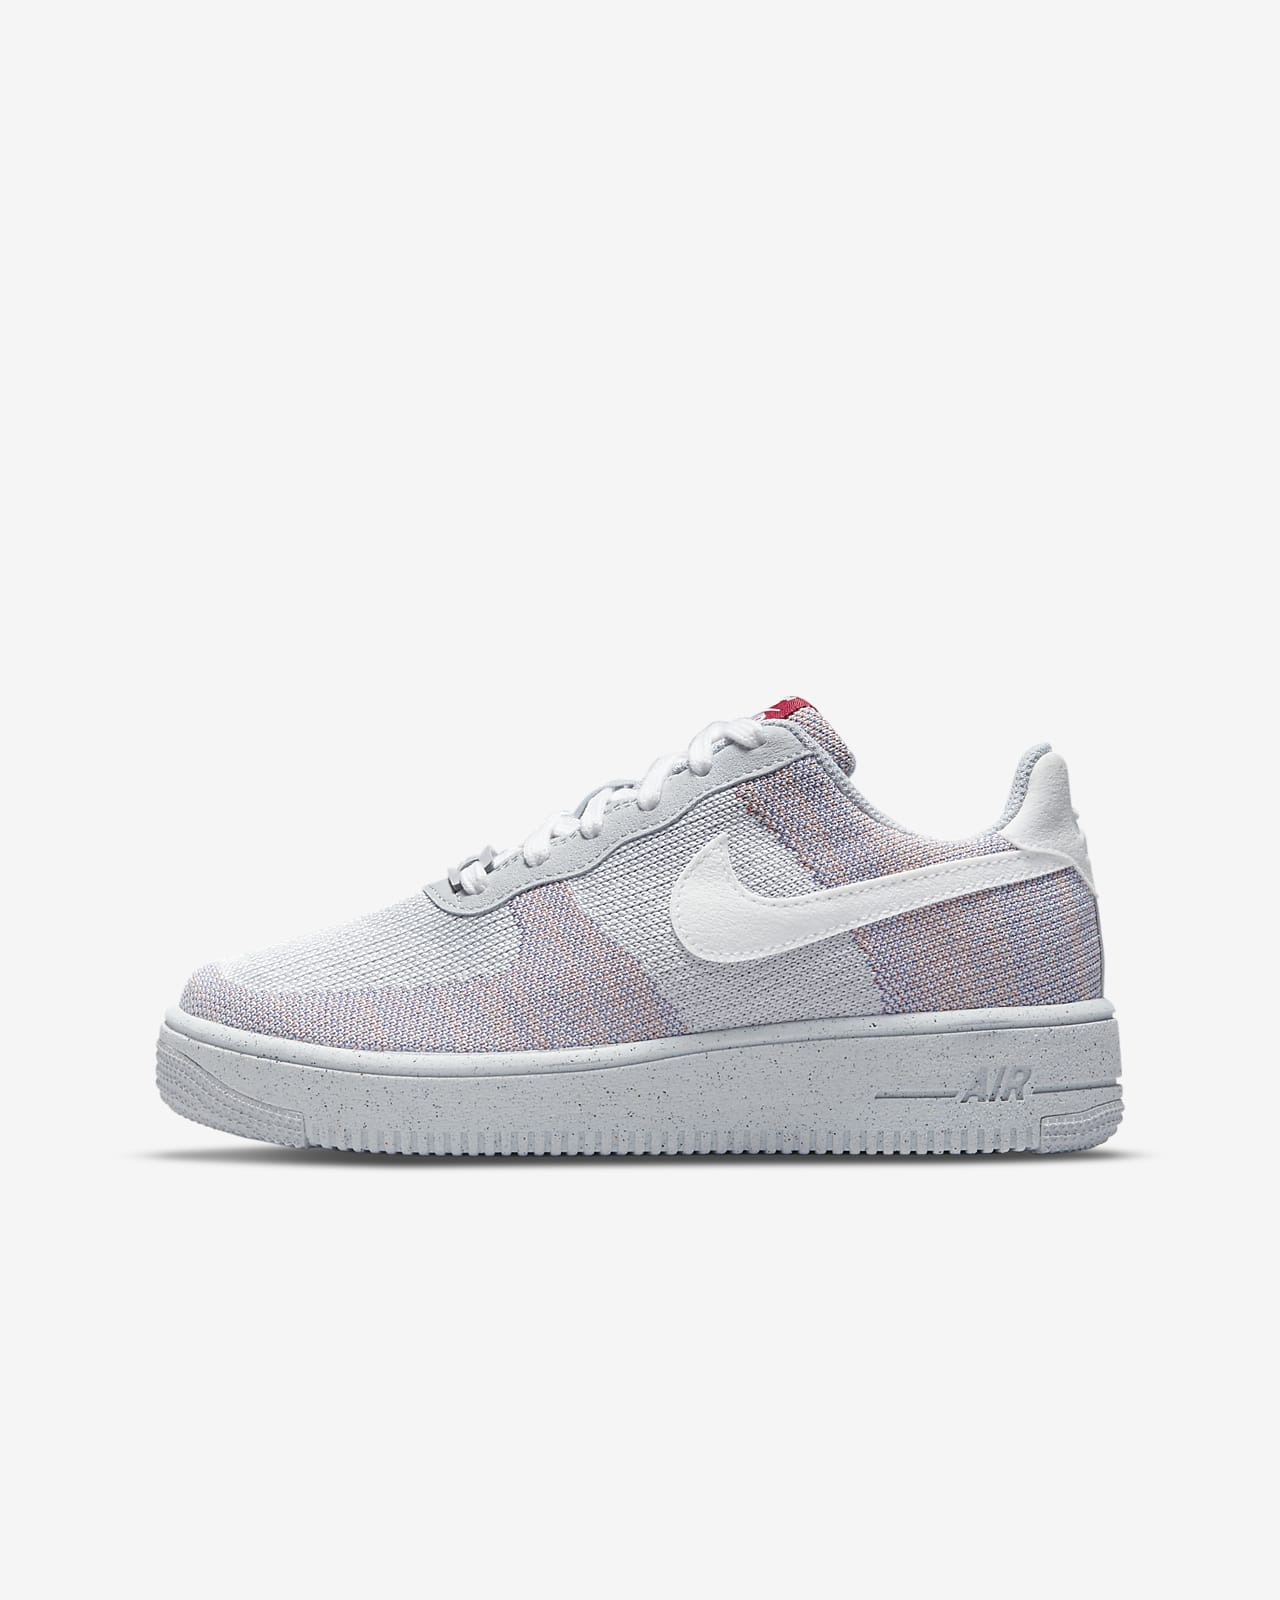 Buty dla dużych dzieci Nike Air Force 1 Crater Flyknit